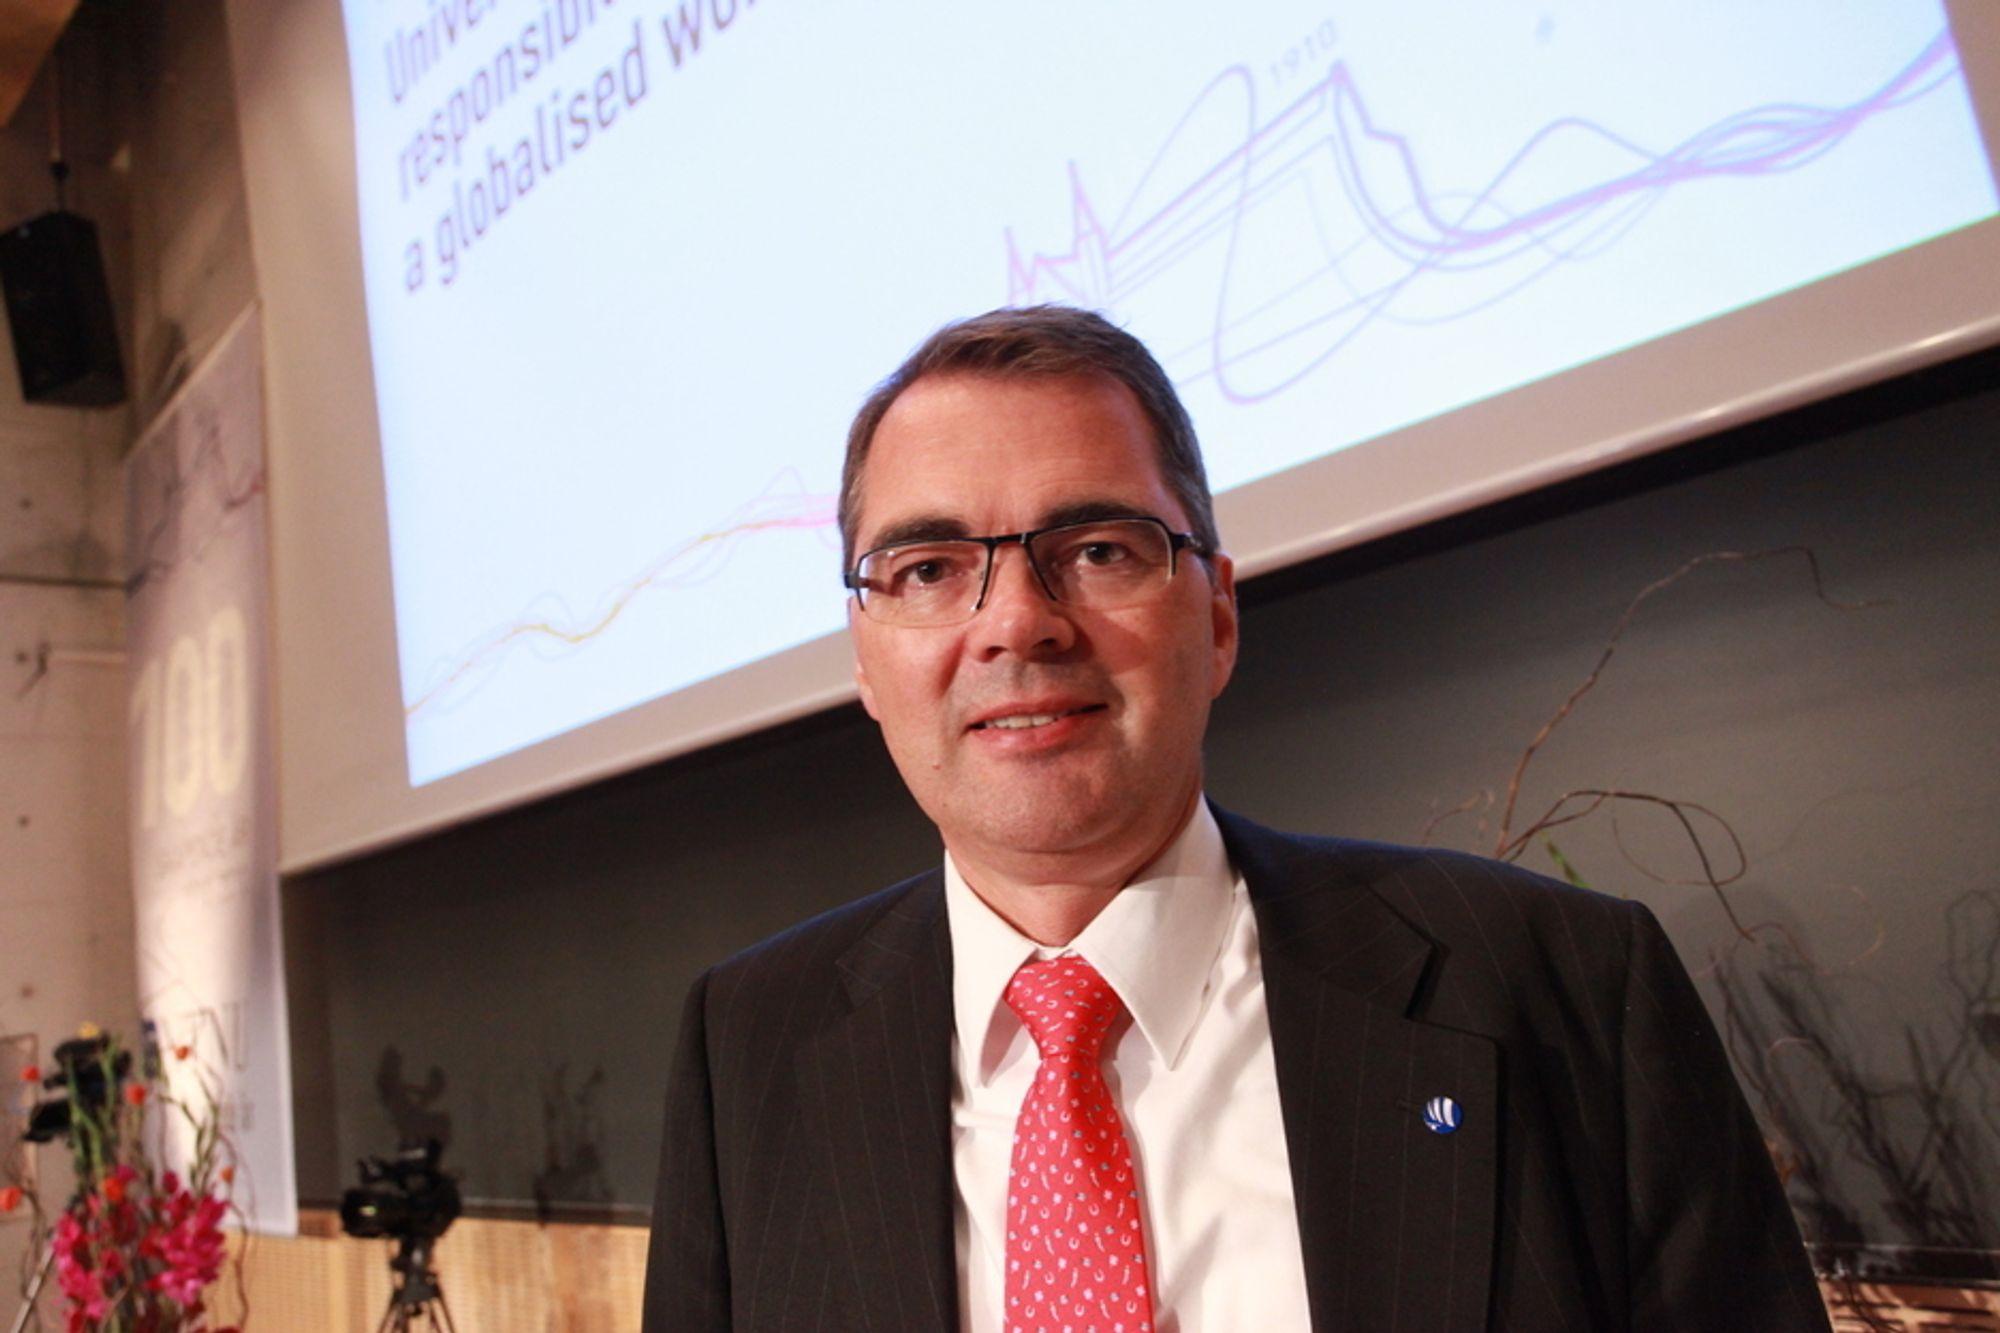 POSITIV: - 2010 var et vendepunkt for Hydro, og 2011 vil markere dette skiftet, sier konsernsjef Svein Richard Brandtzæg  Hydro.